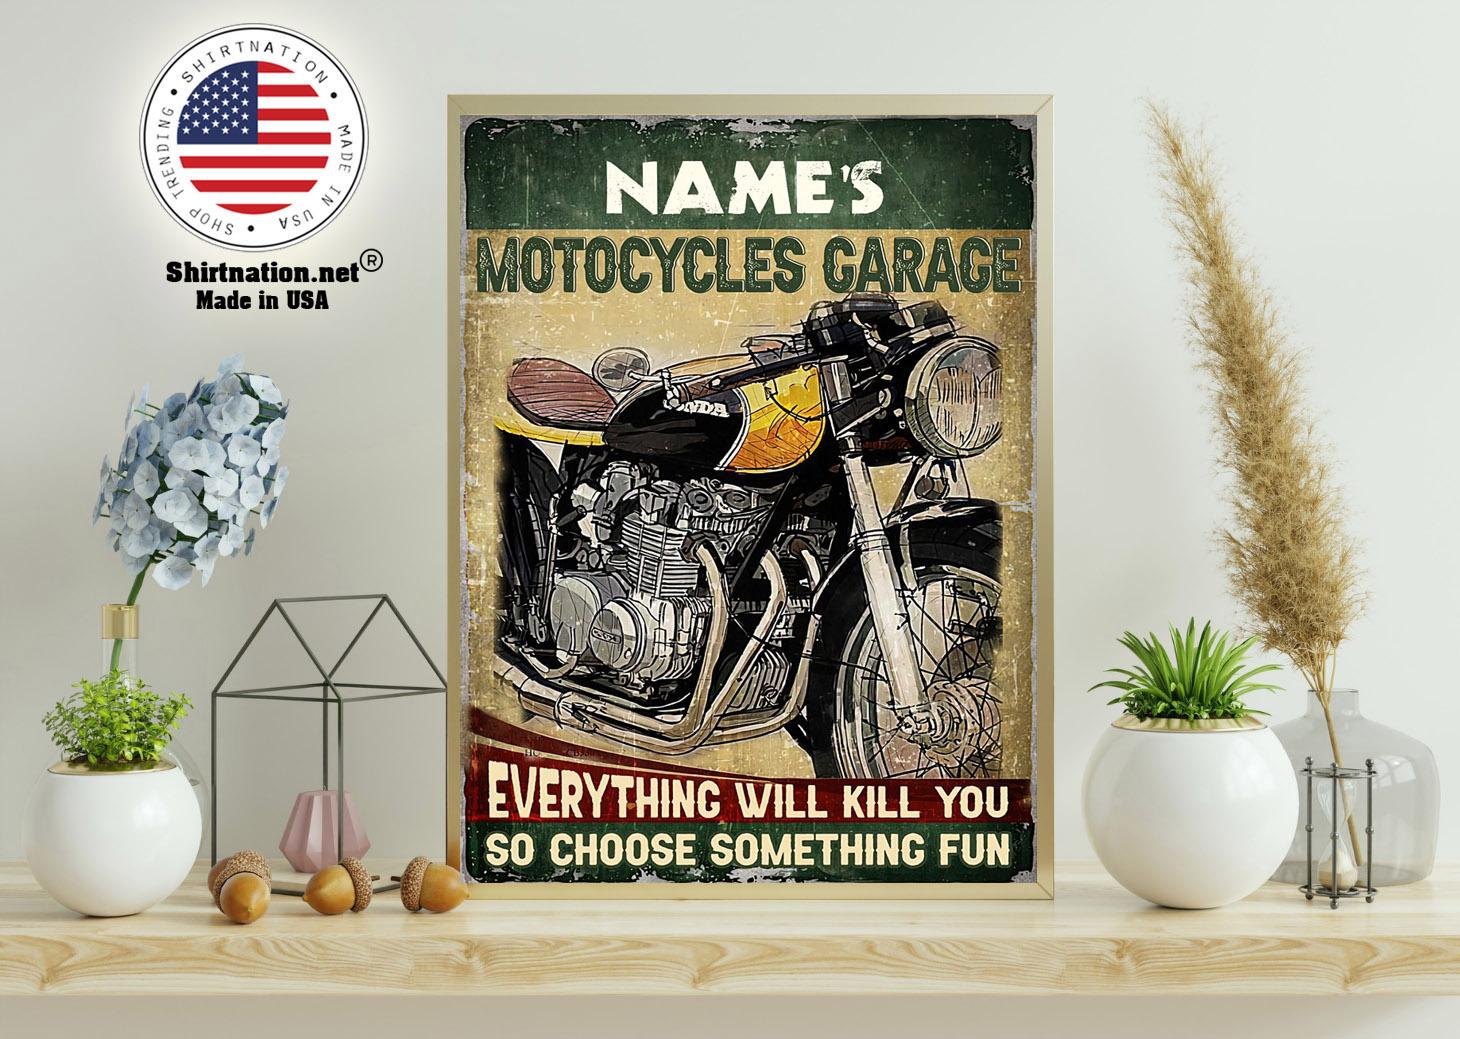 Motocycles garage eveyrthing will kill you so choose something fun custom name poster 11